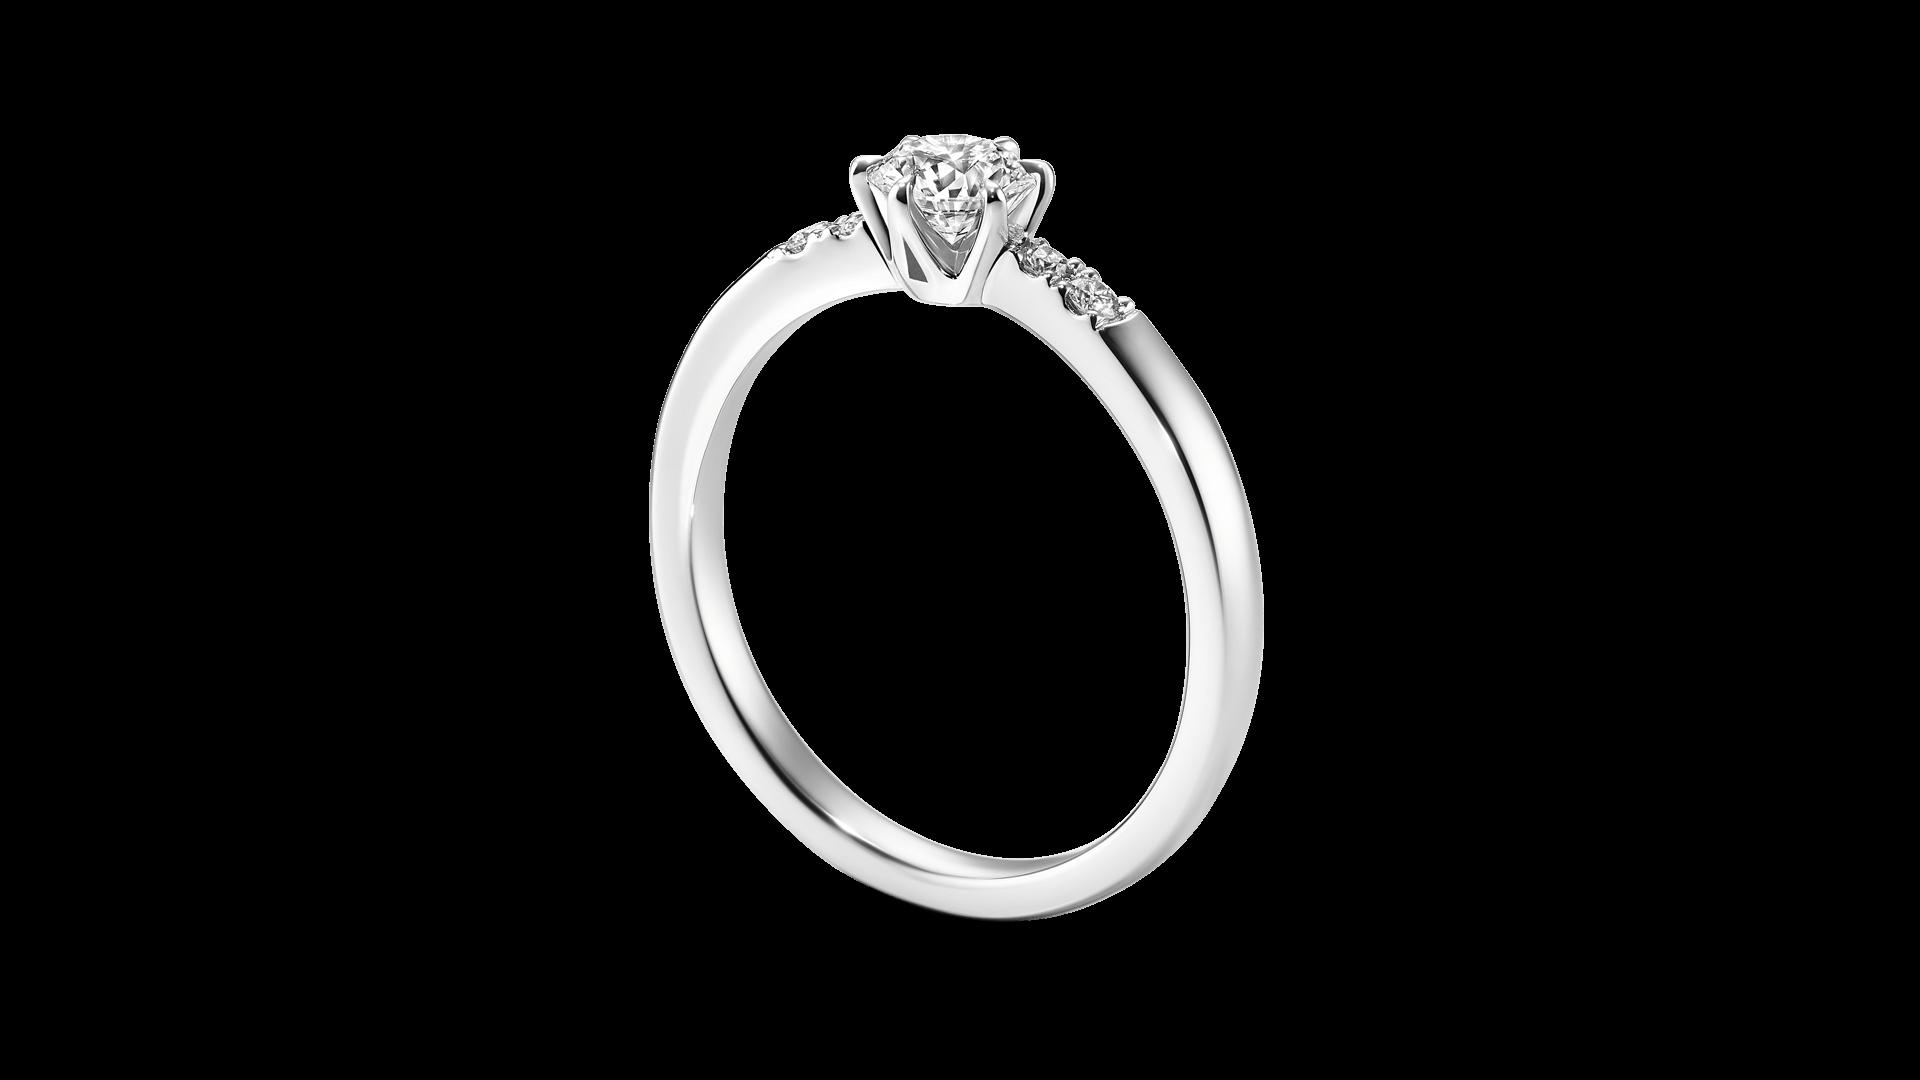 melpe メルーペ≪7月23日(木)発売≫ | 婚約指輪サムネイル 3